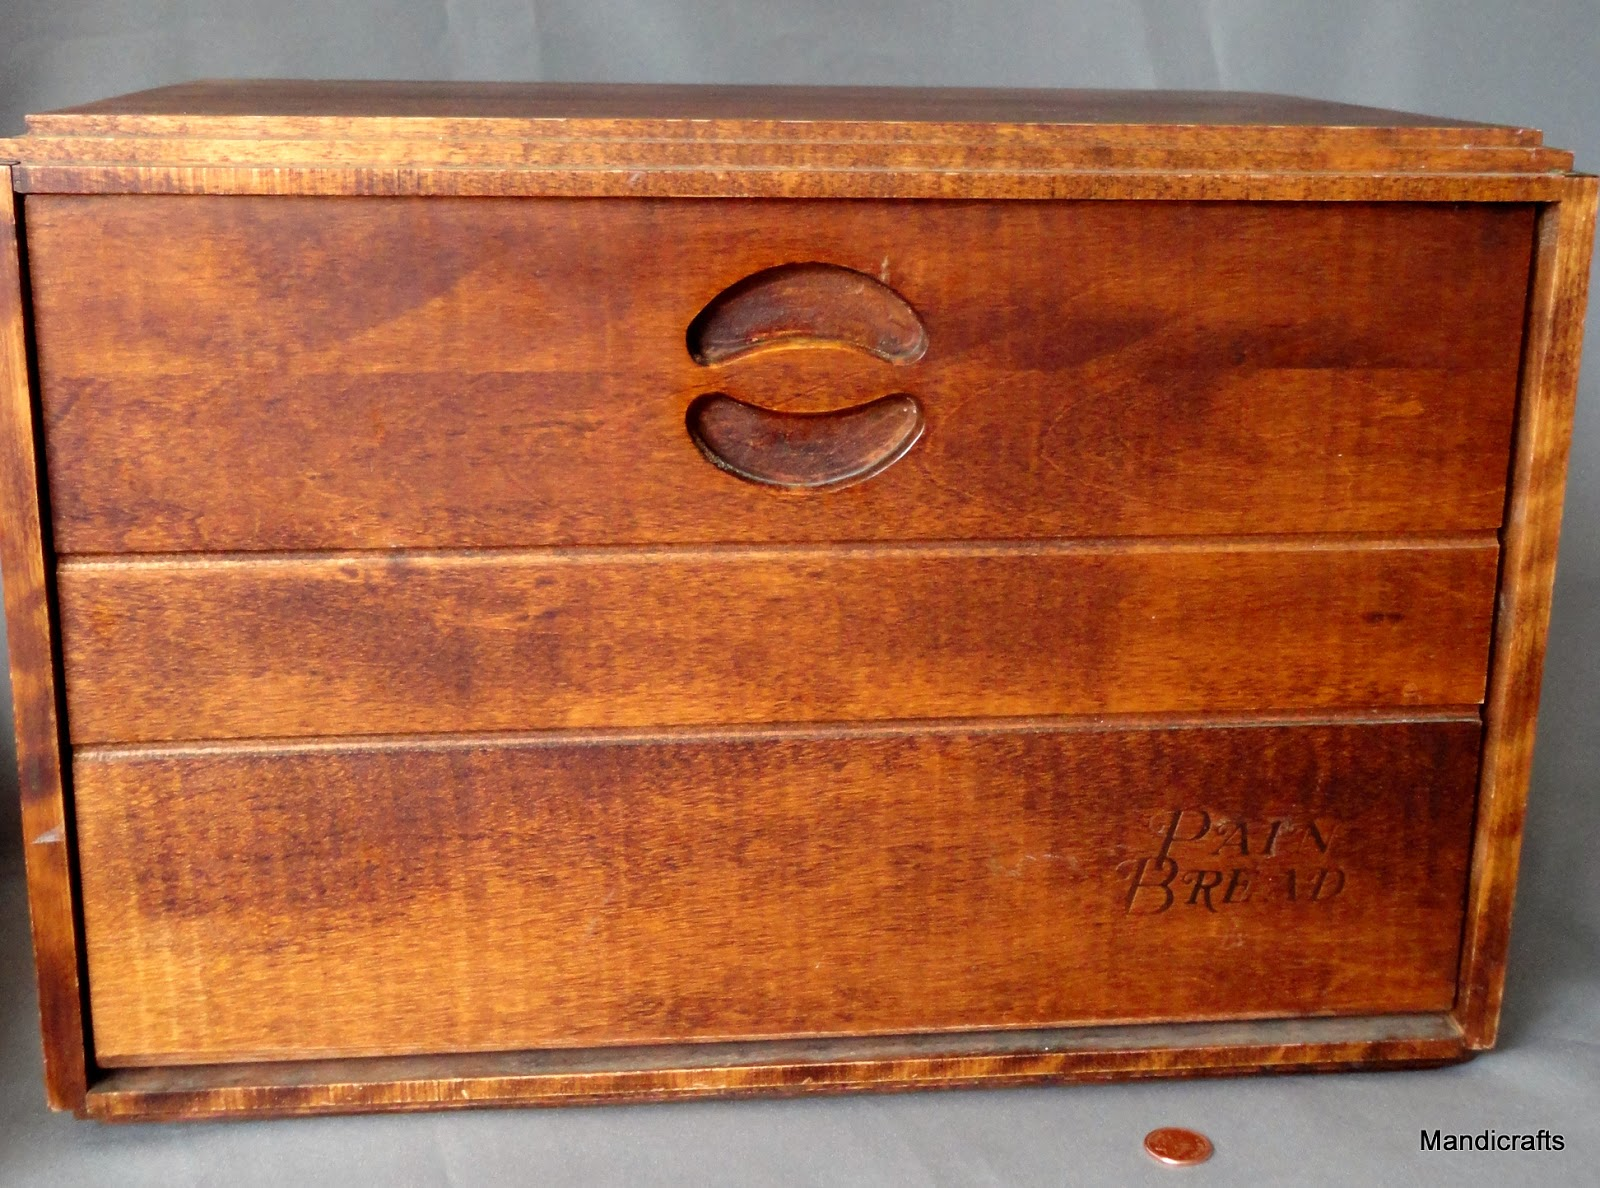 Baribocraft Baribo Maid Canada Vintage Woodenware